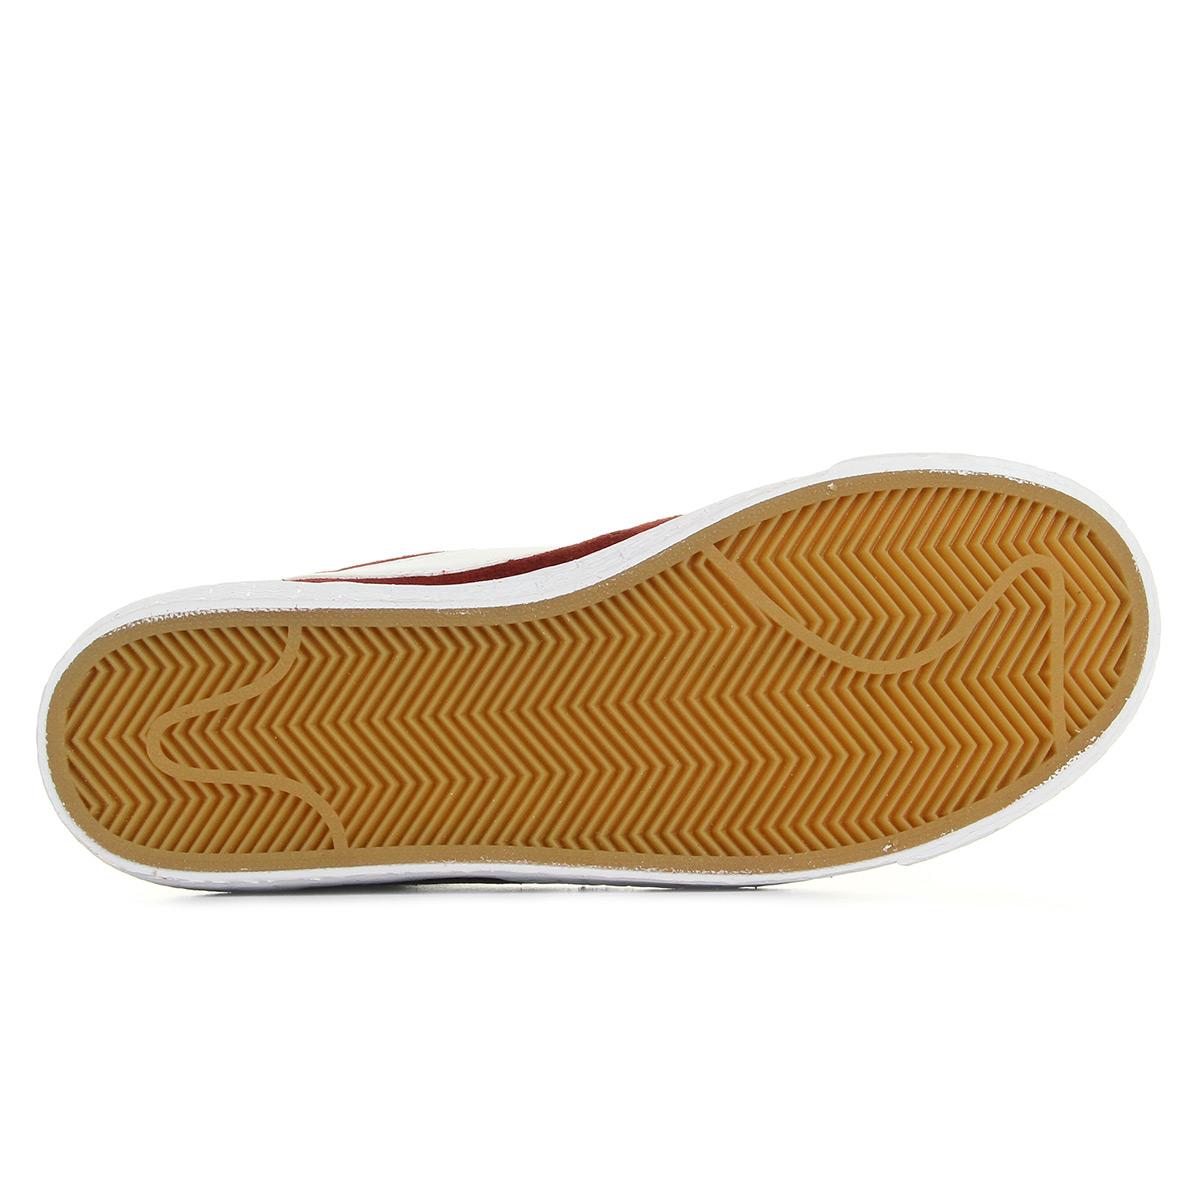 Nike Wmns Blazer Mid Suede 871929600, Baskets mode